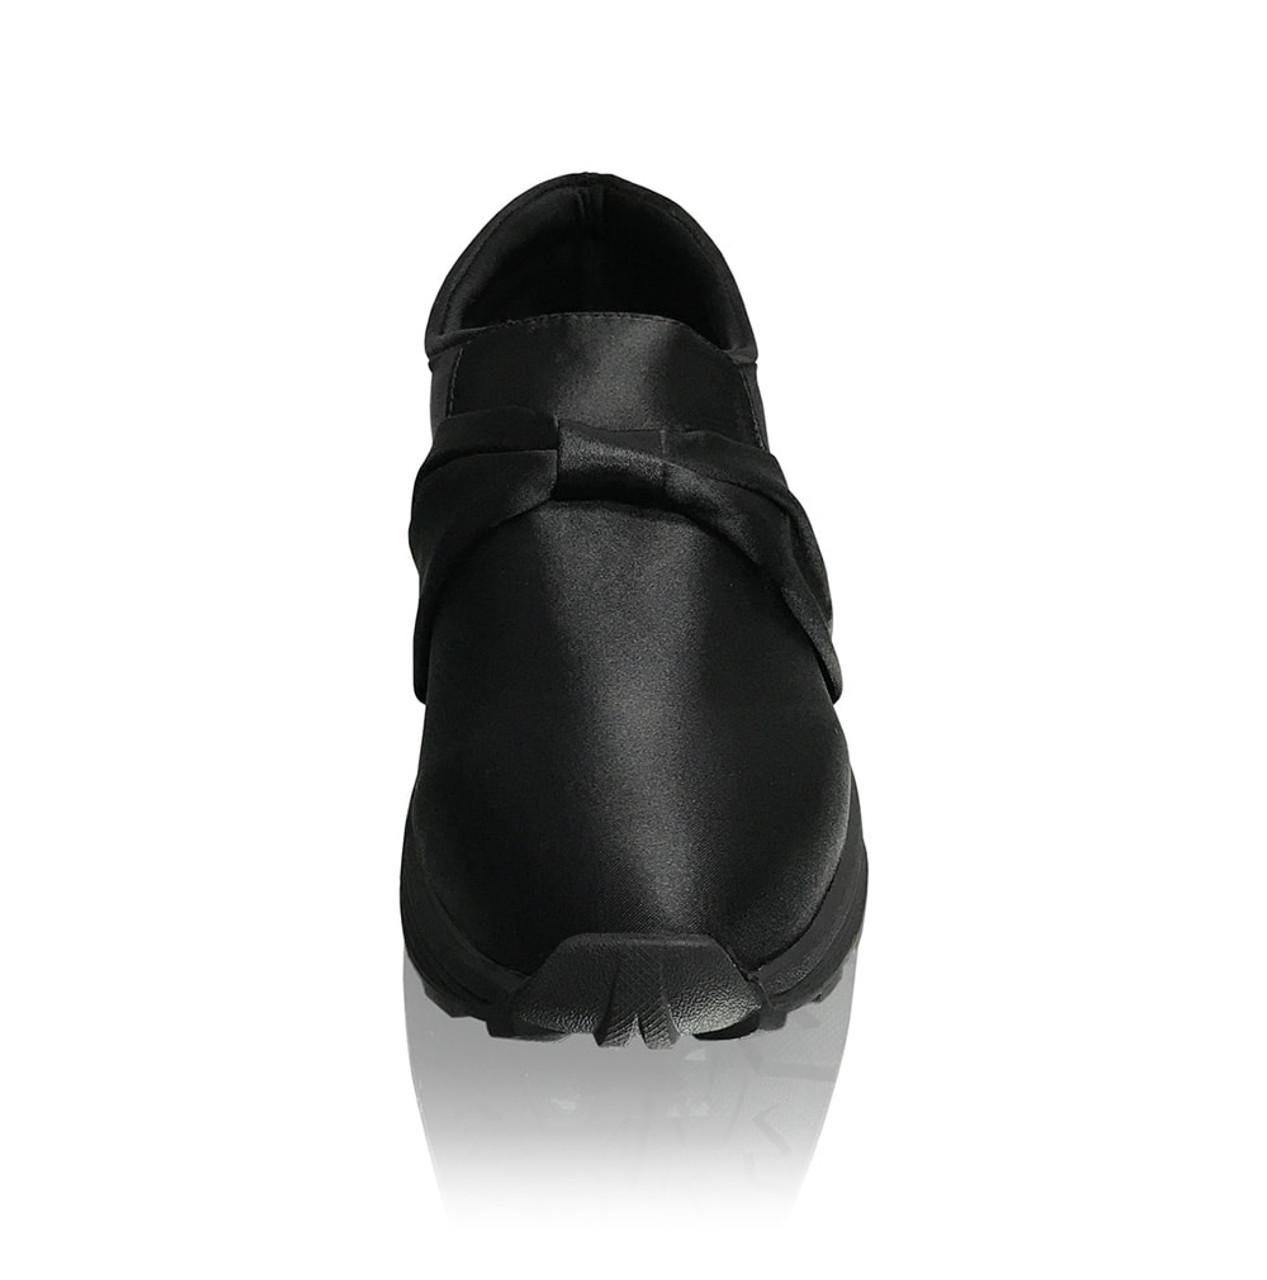 Black Detachable Bow Satin Fashion Sneakers